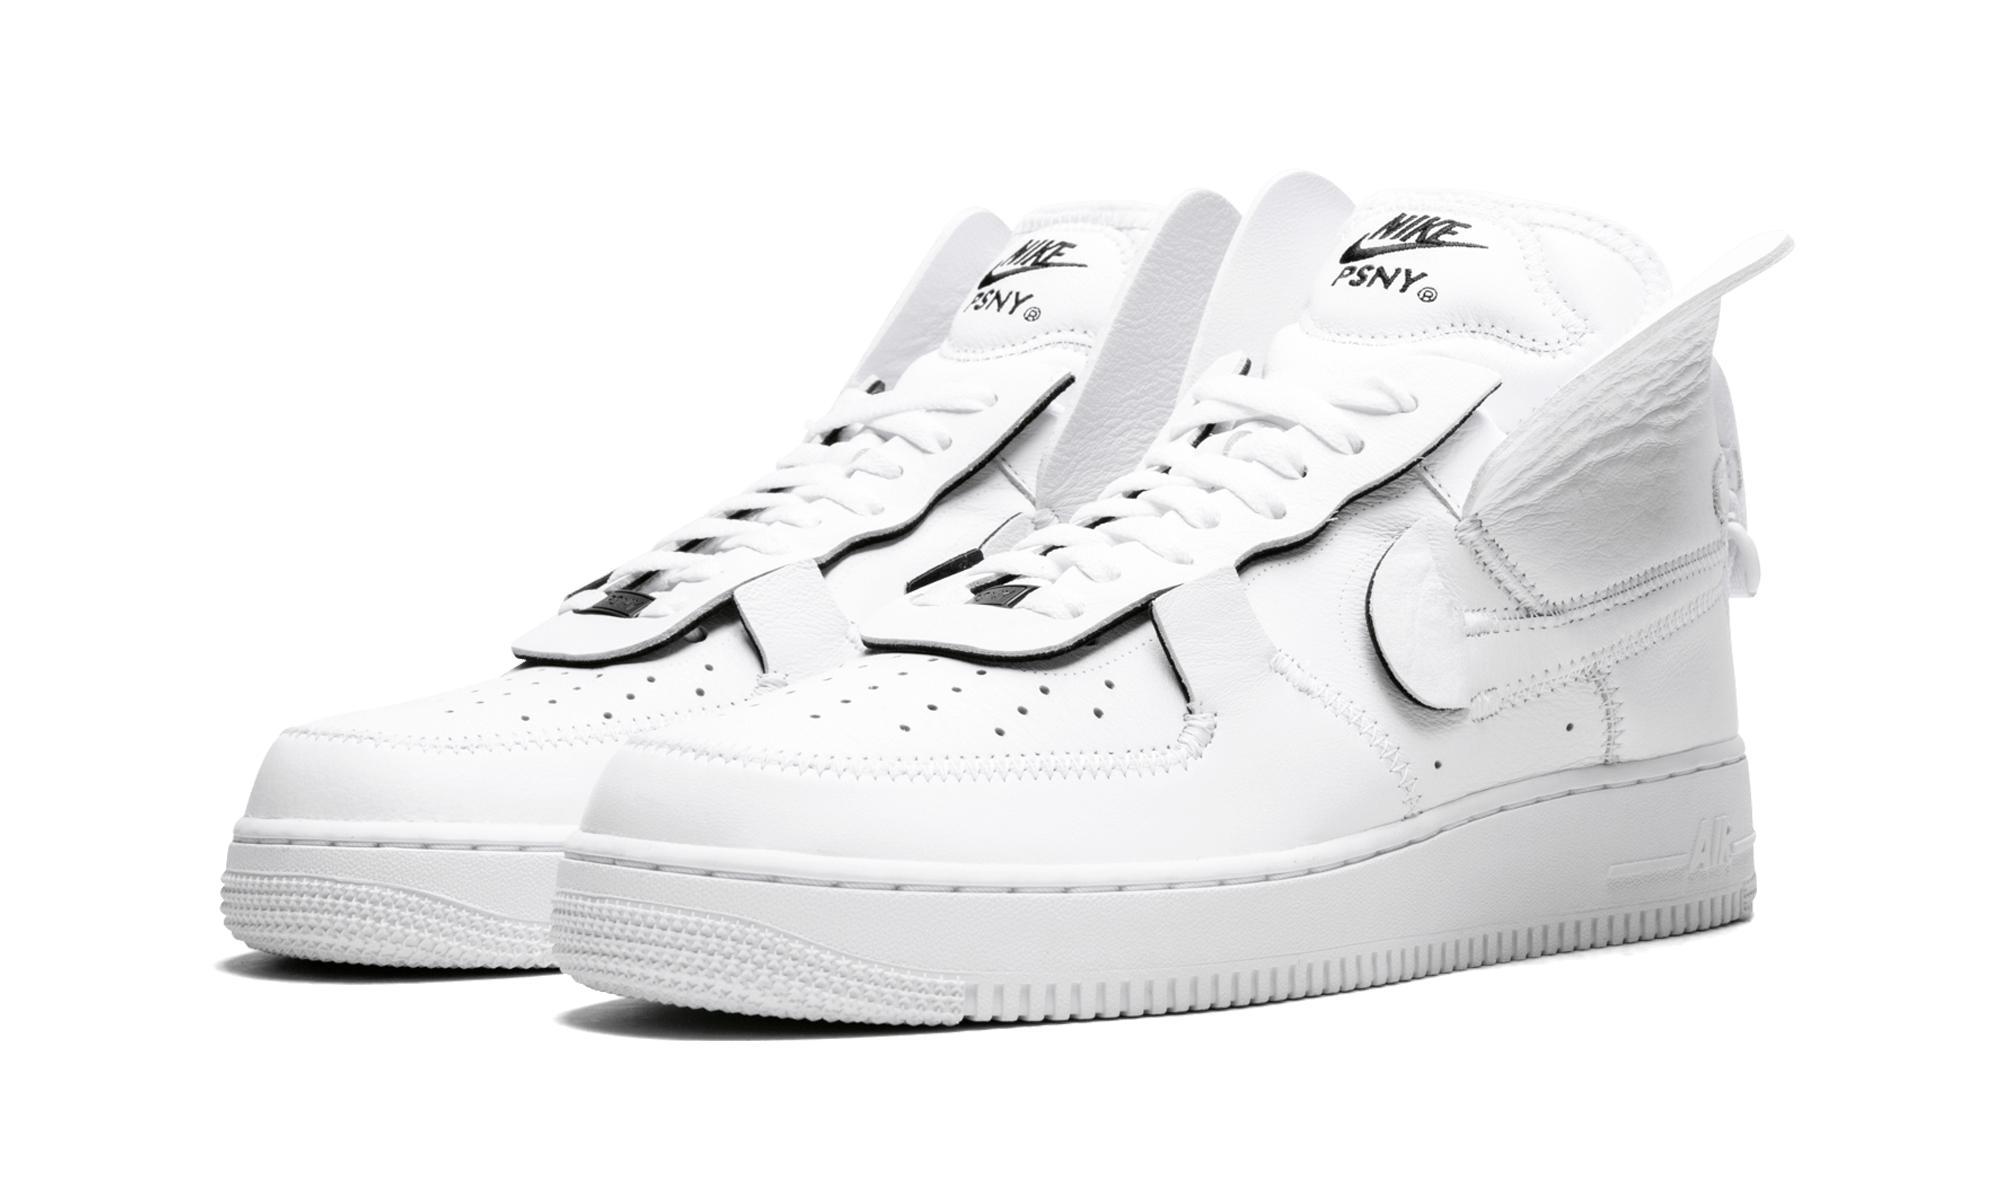 Nike - White Air Force 1 High Psny - Lyst. View fullscreen 7da45fdfd